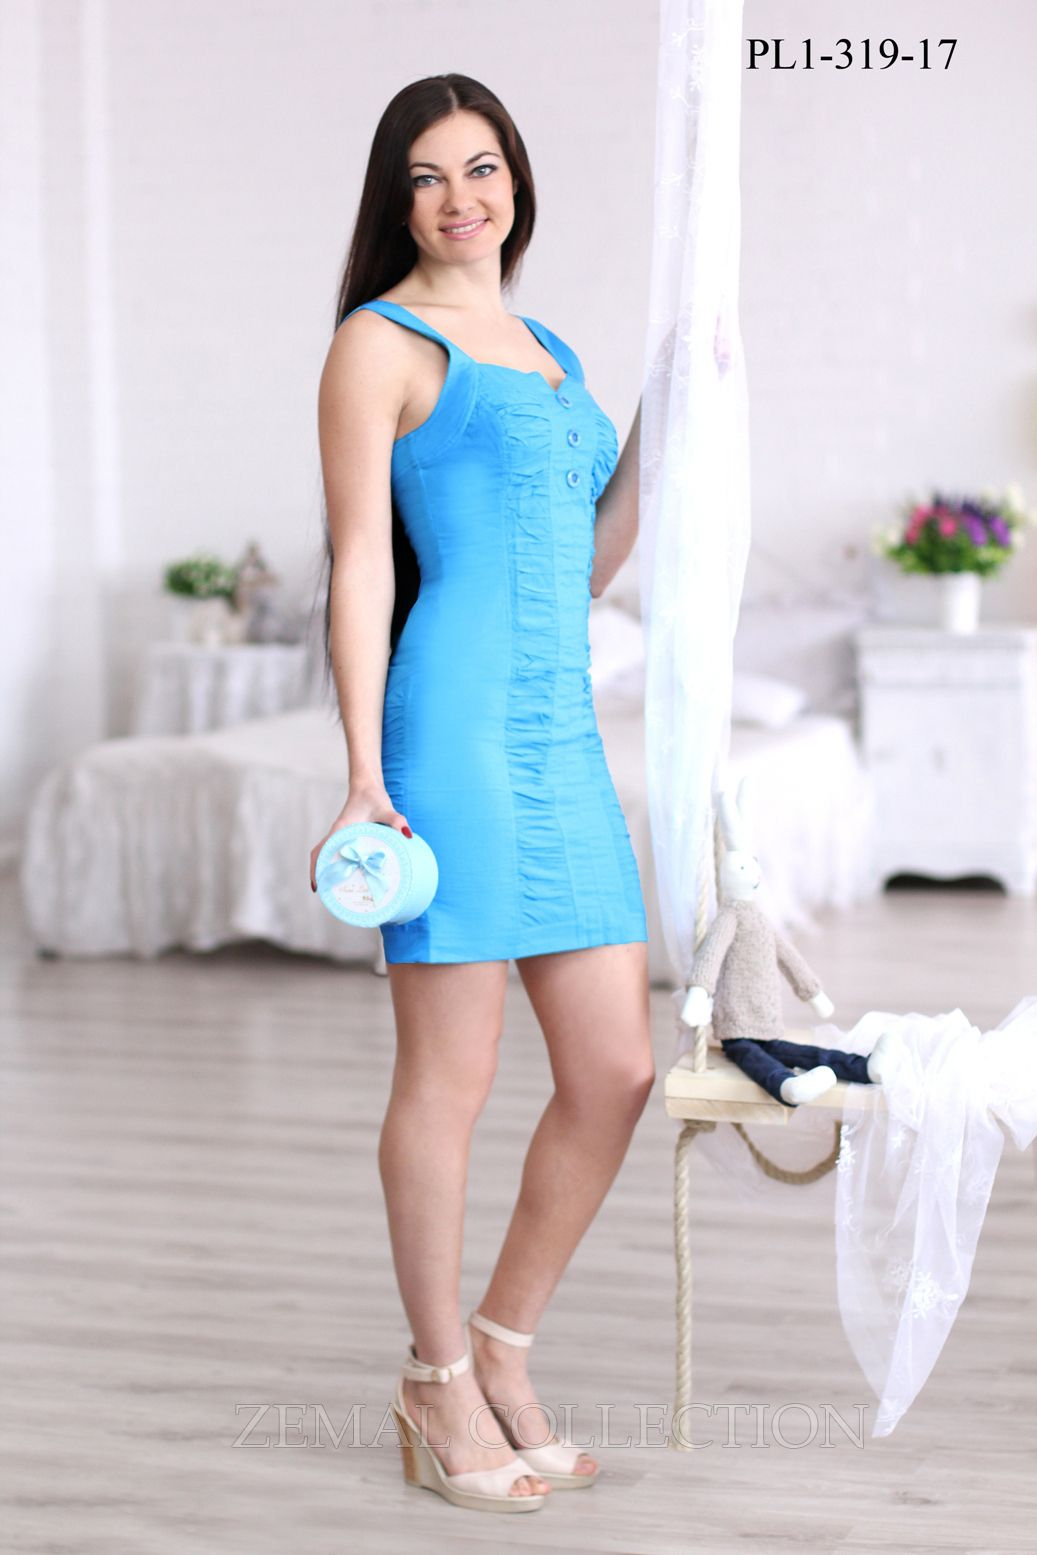 Сарафан pl1-319 купить на сайте производителя